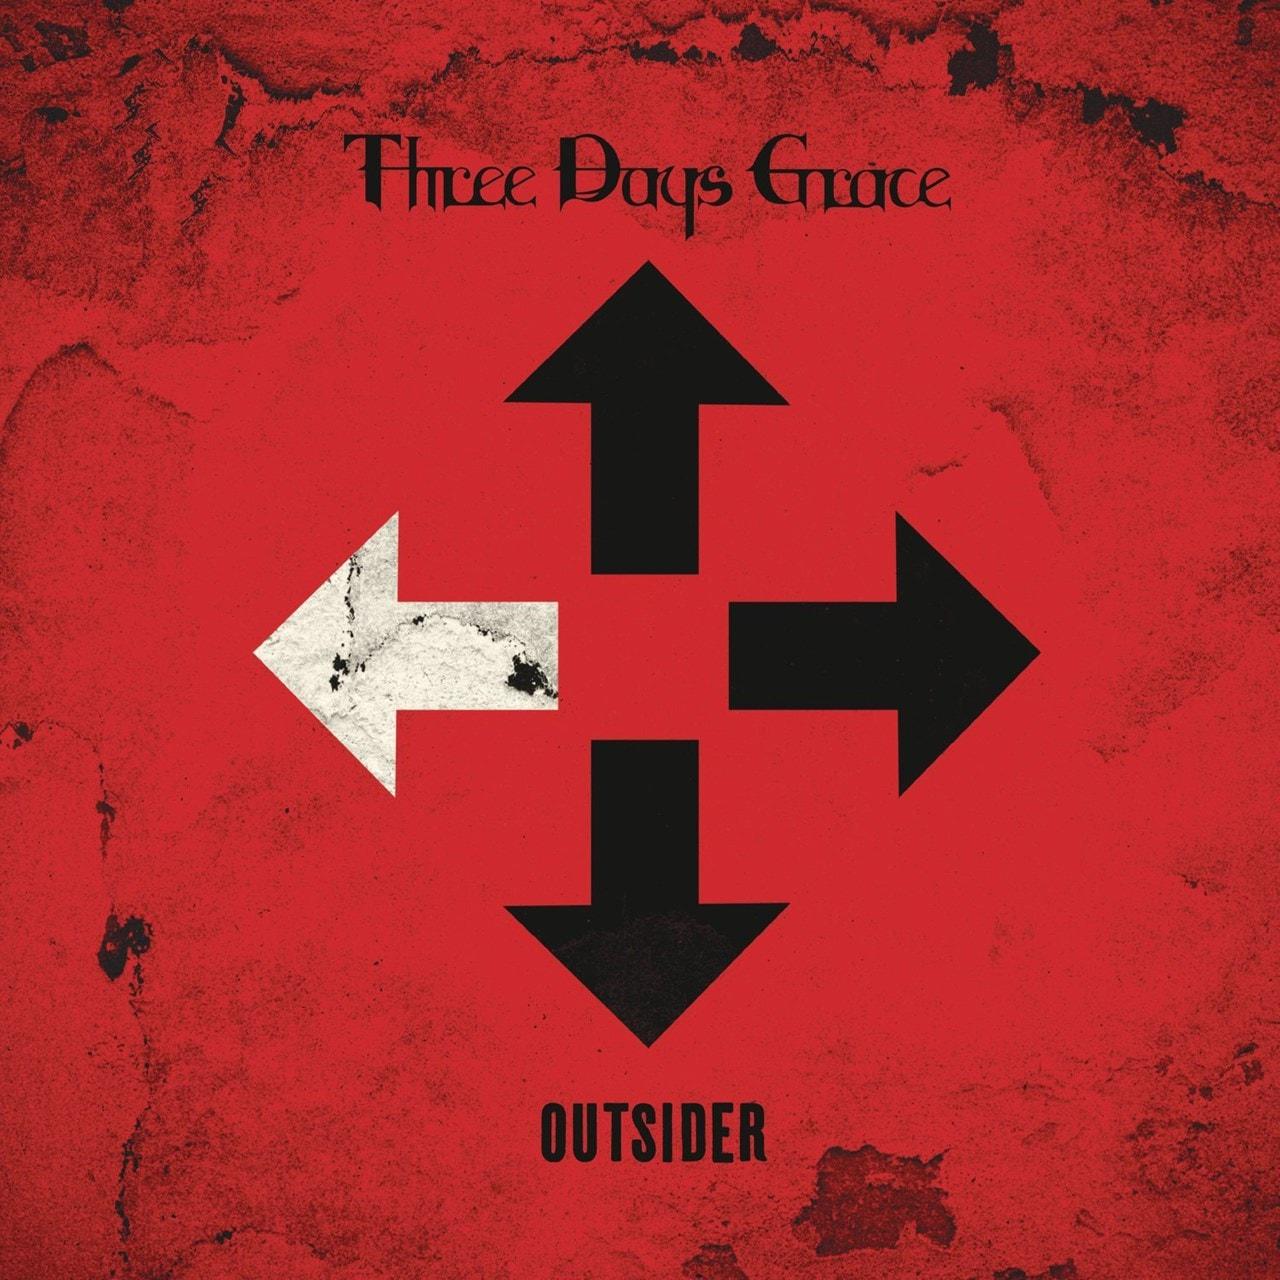 Outsider - 1